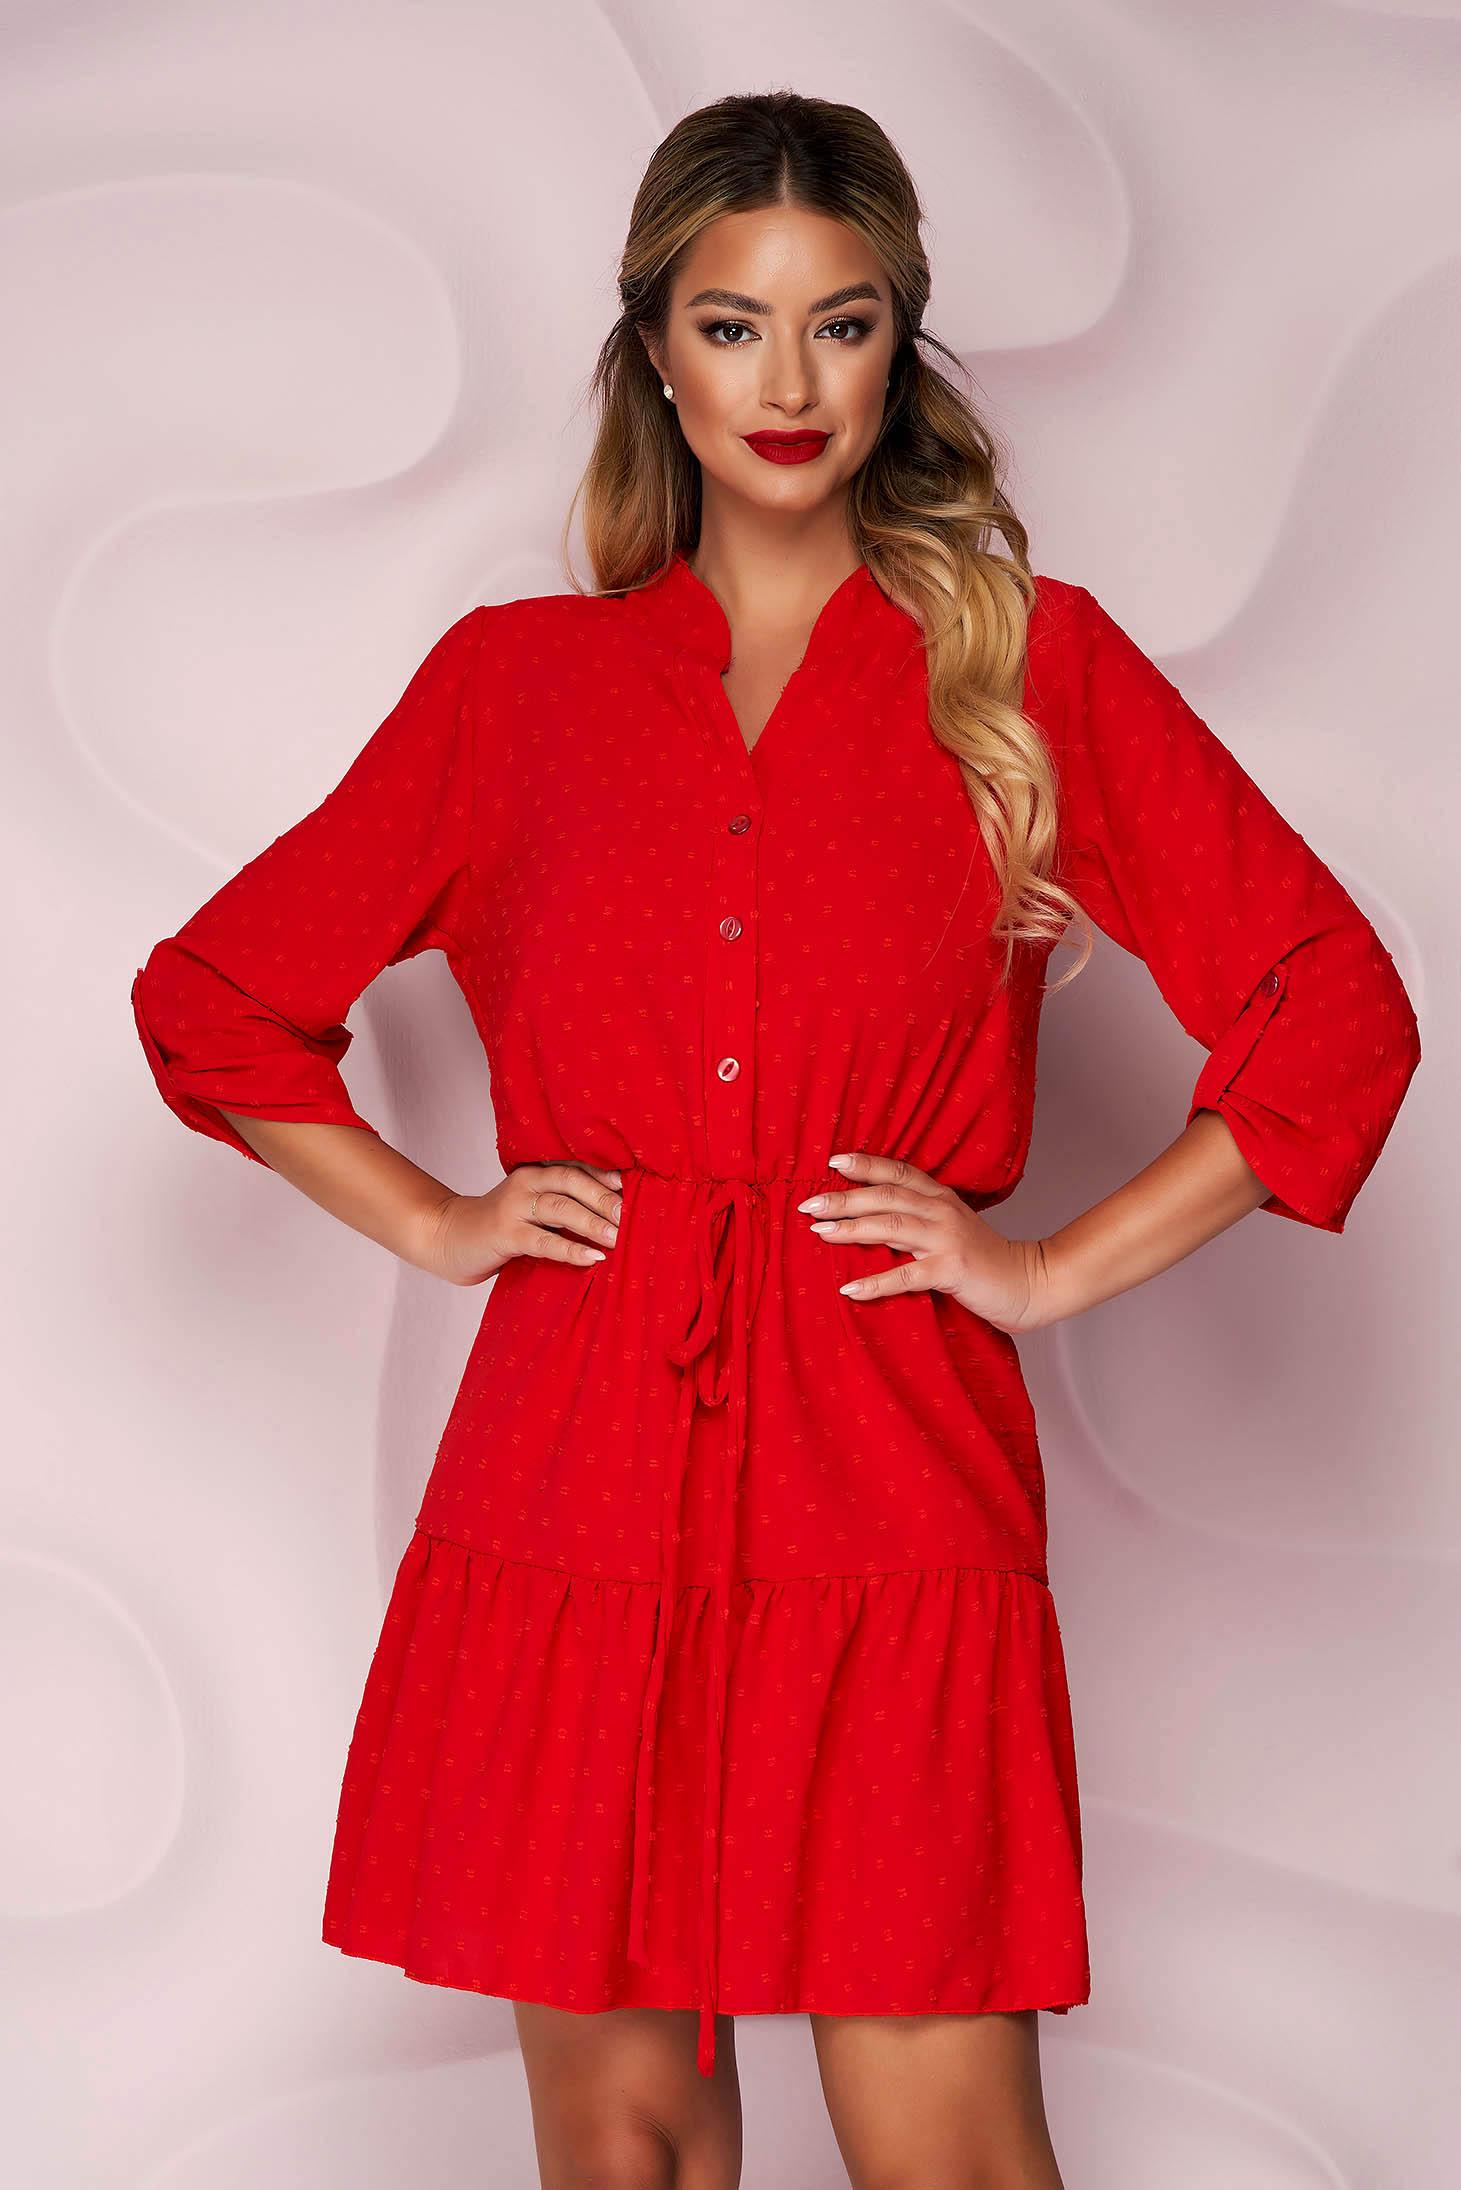 Red dress short cut cloche with elastic waist from veil fabric plumeti